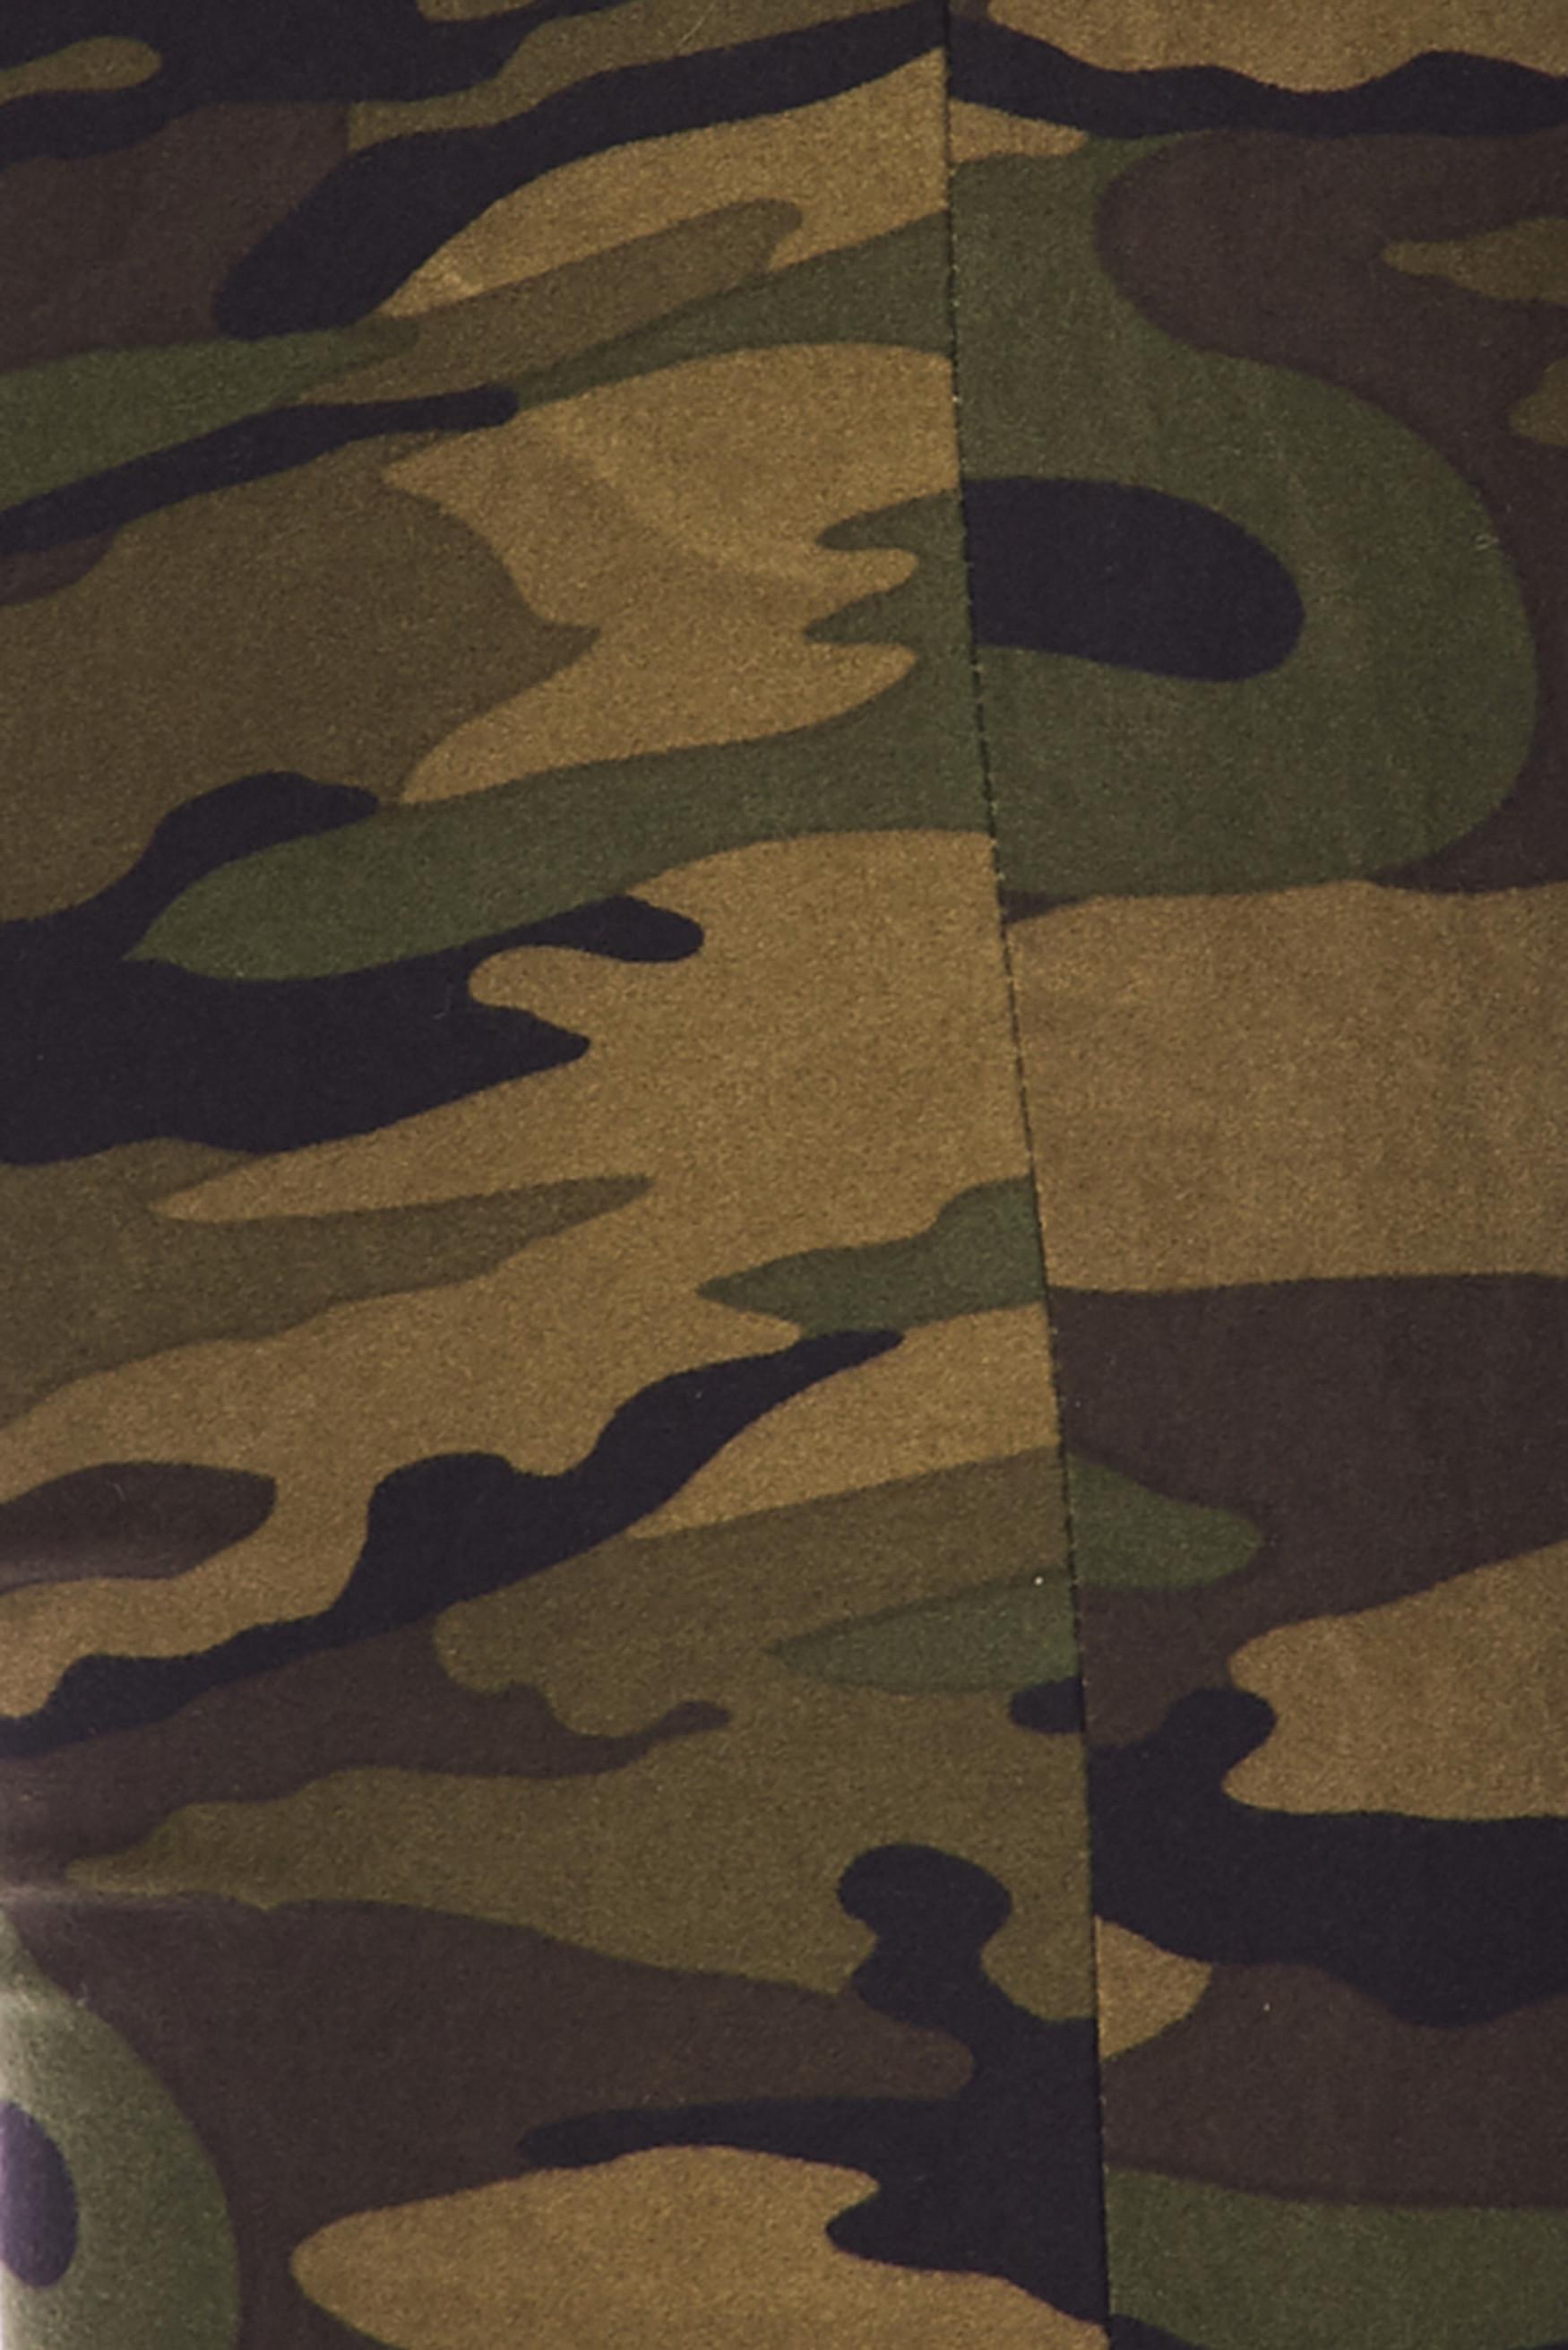 Brushed Green Camouflage Bell Bottom Leggings